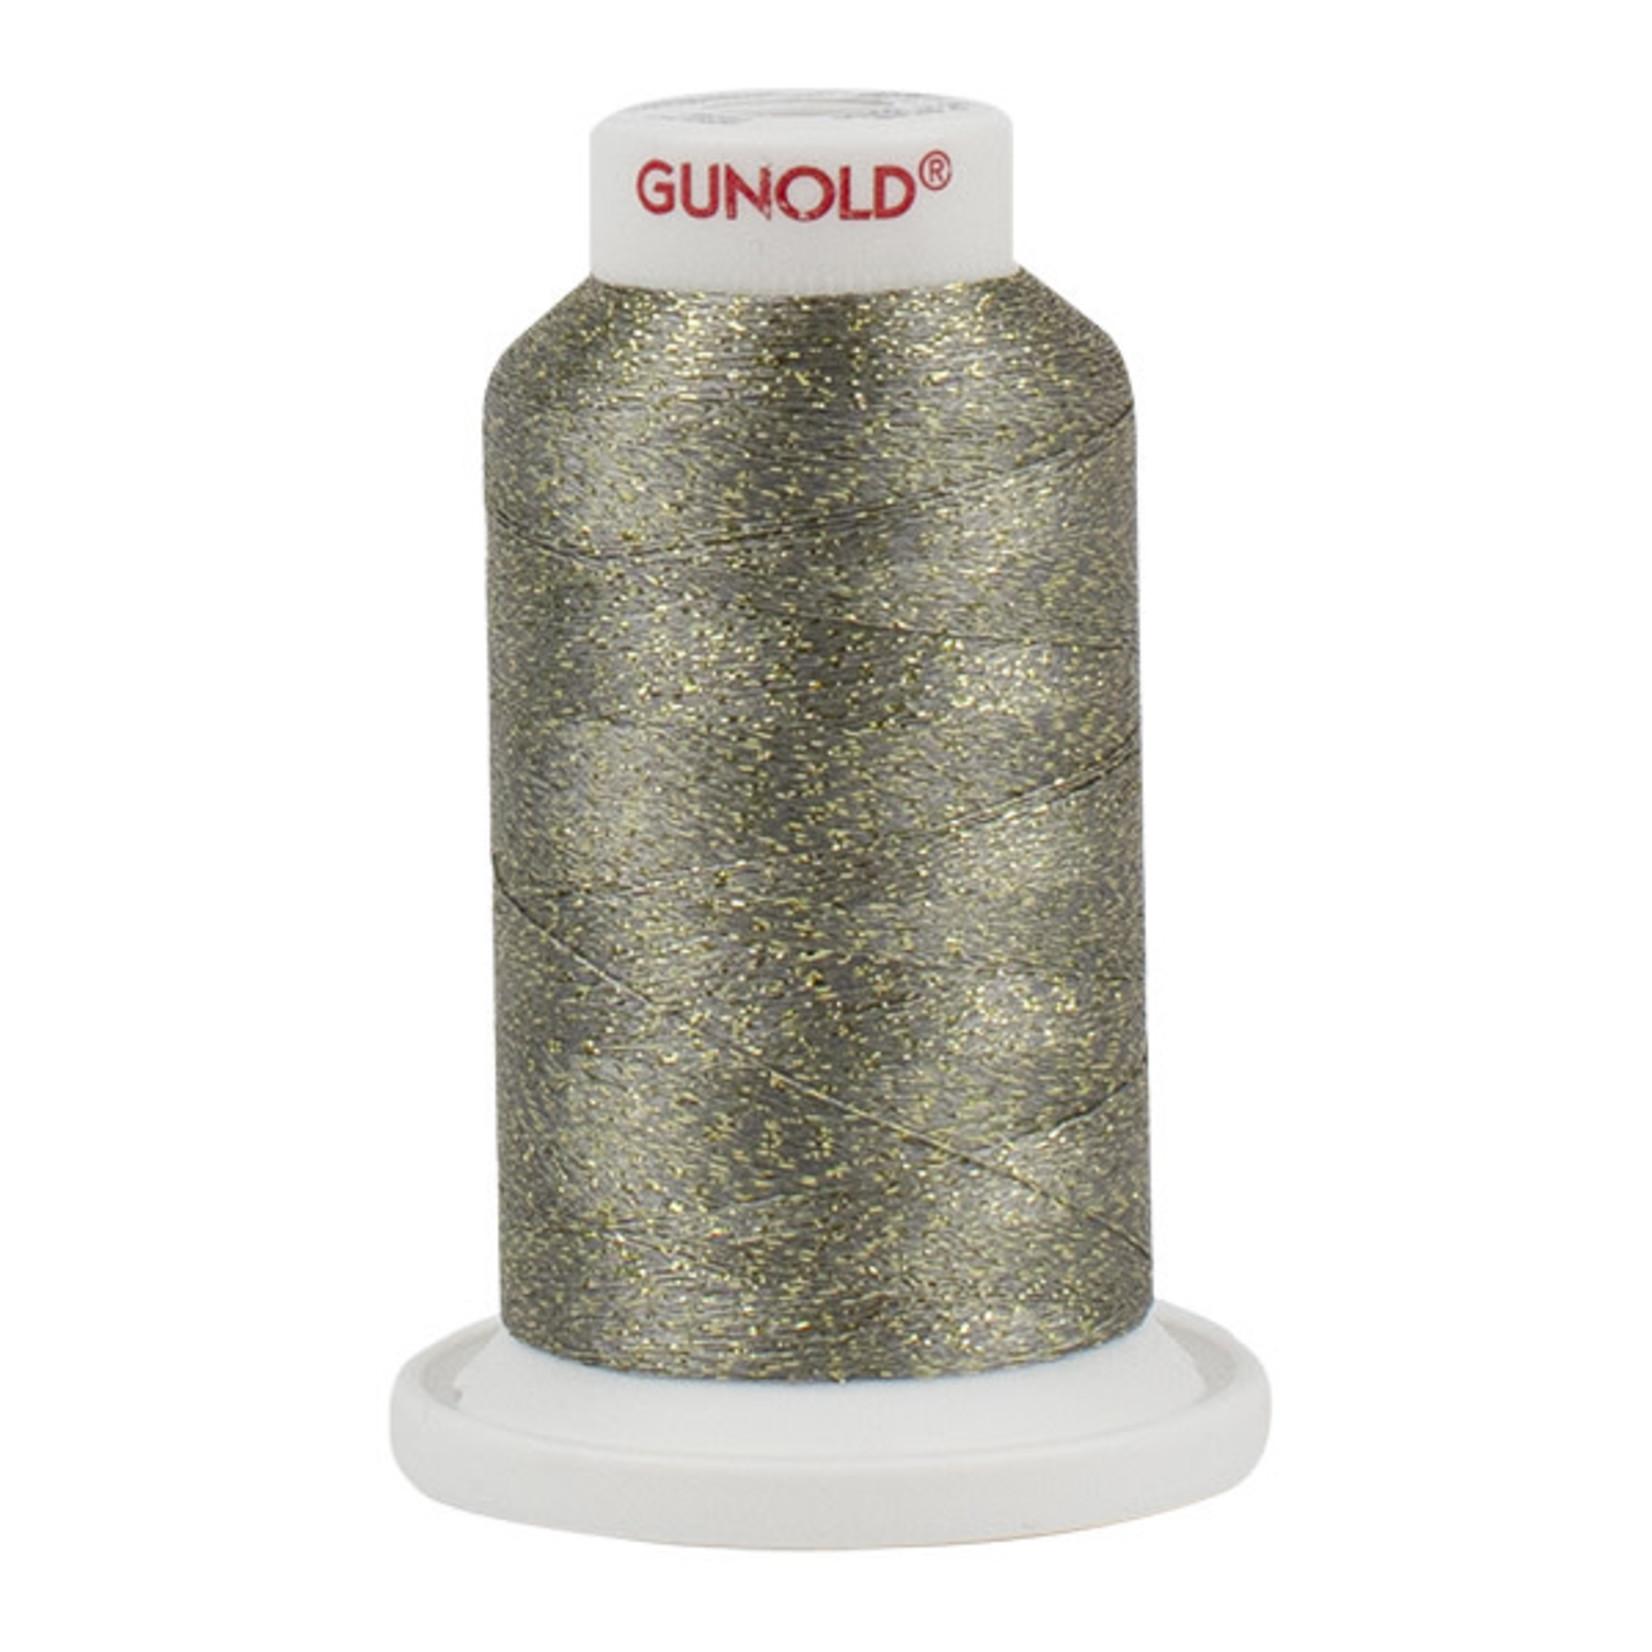 Gunold Poly Sparkle™ (Star™) Mini-King Cone 1,100 YD, 30 Wt, Medium Khaki with Gold Sparkle 50630